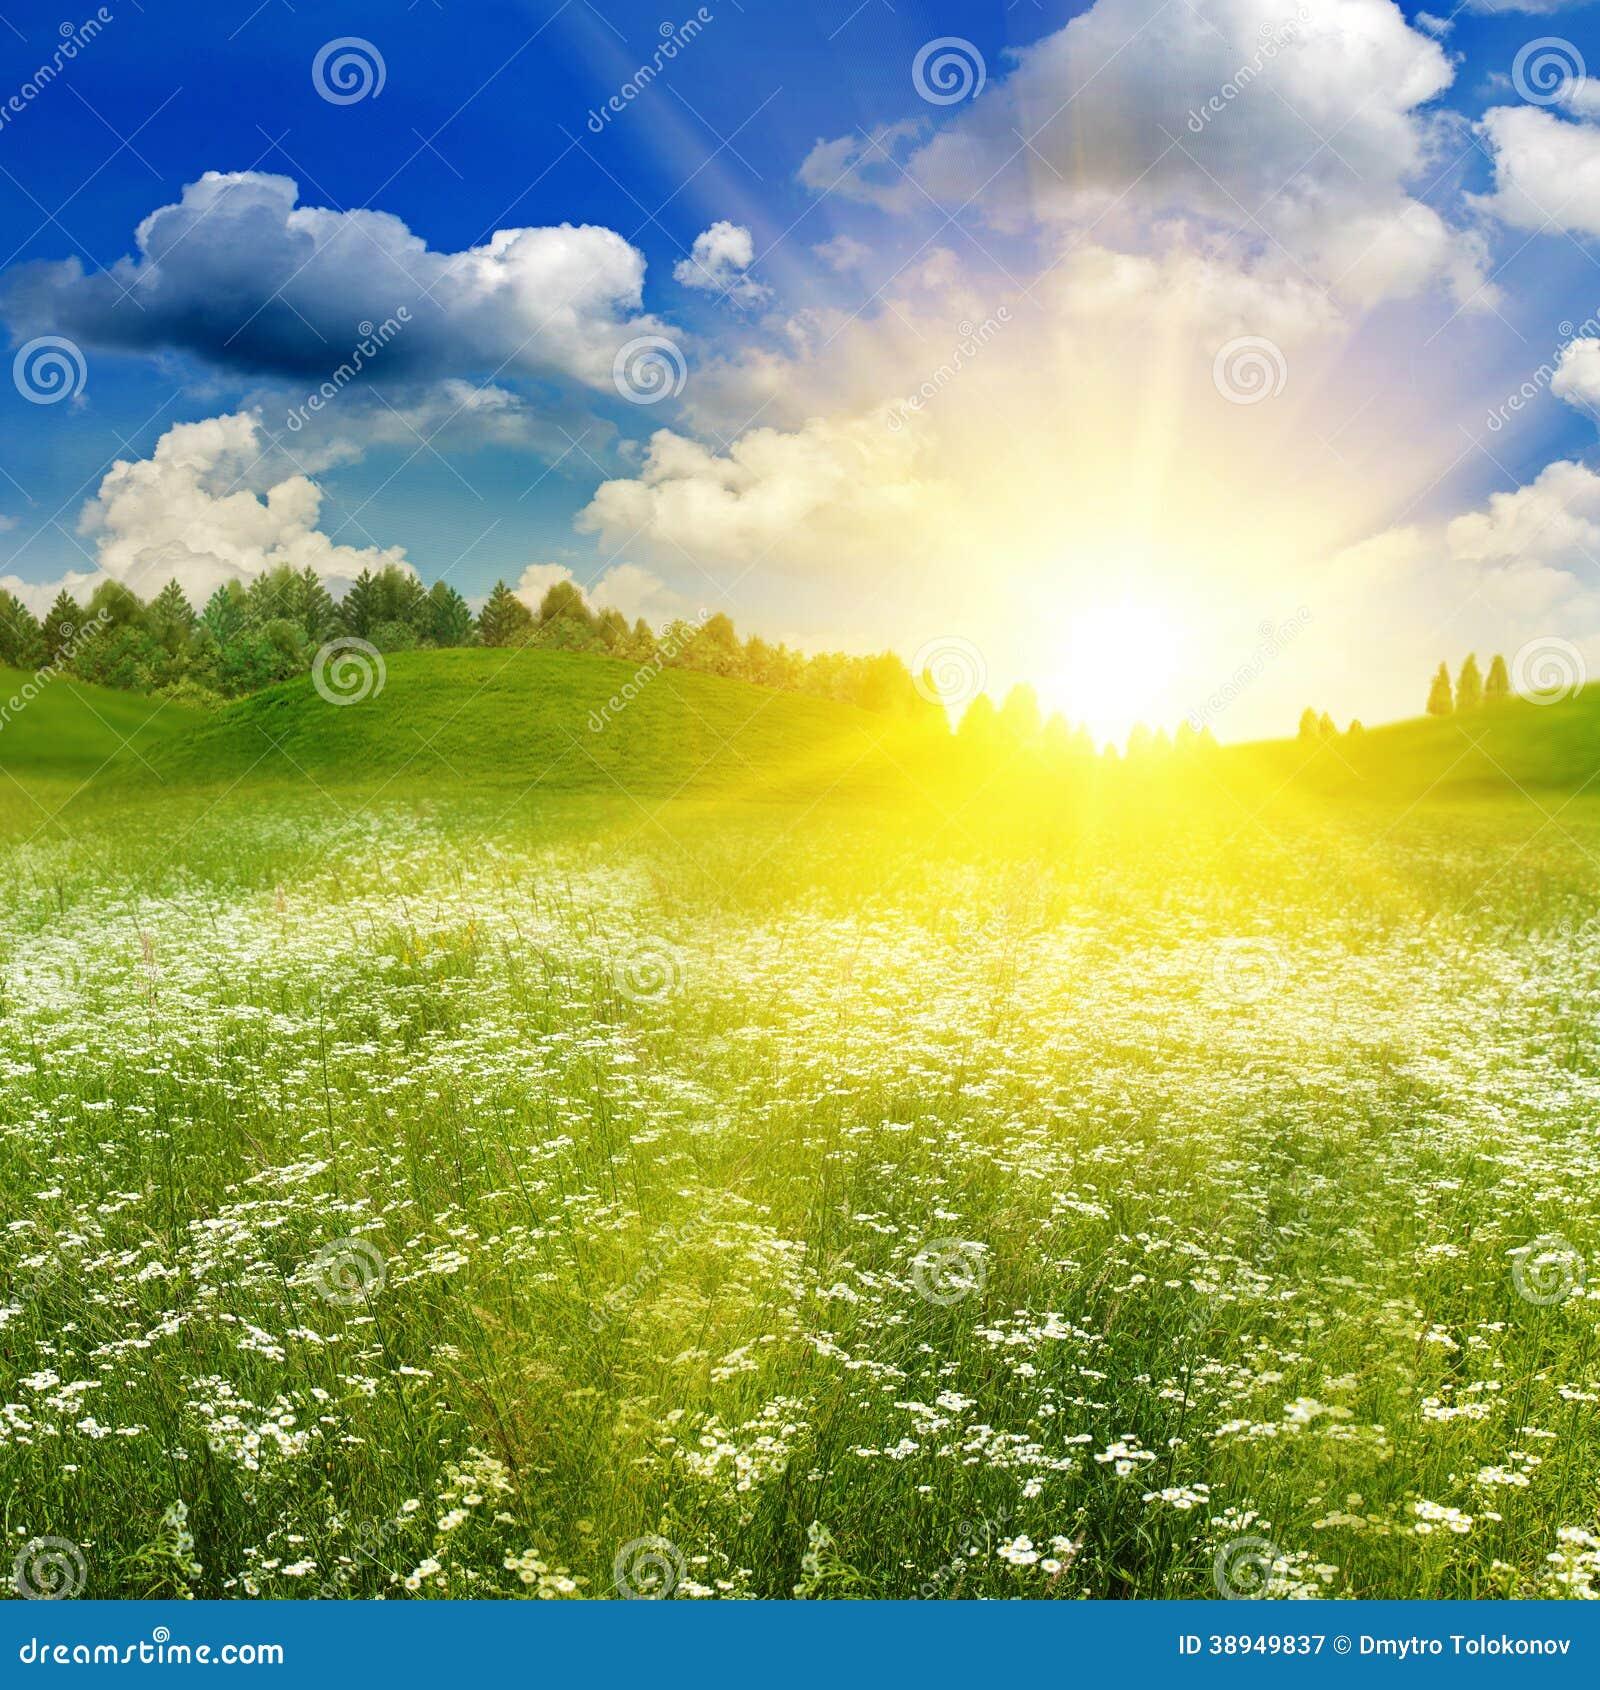 beauty summer field under bright evening sun stock image